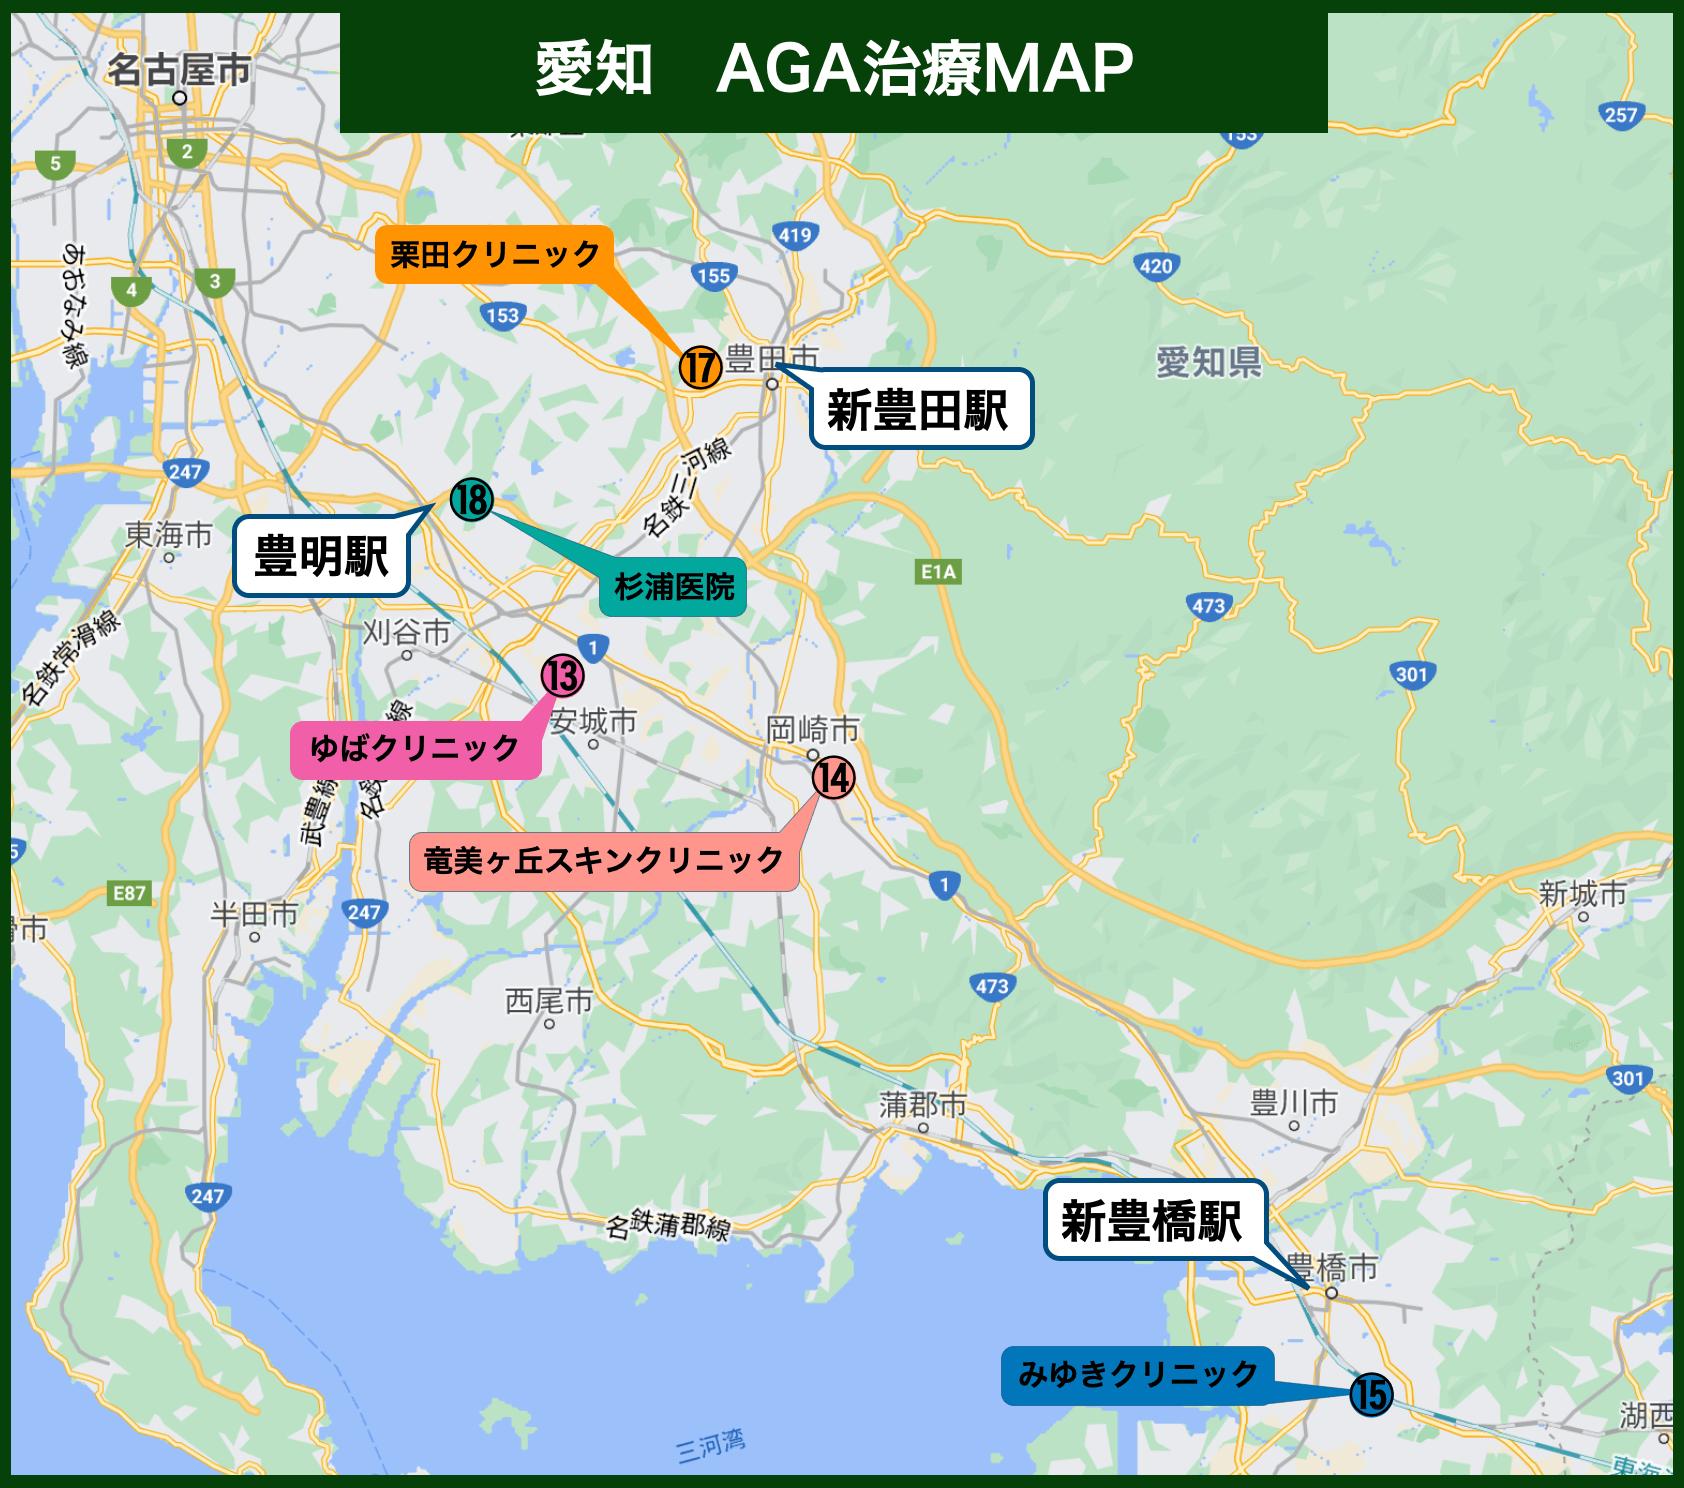 愛知AGA治療MAP